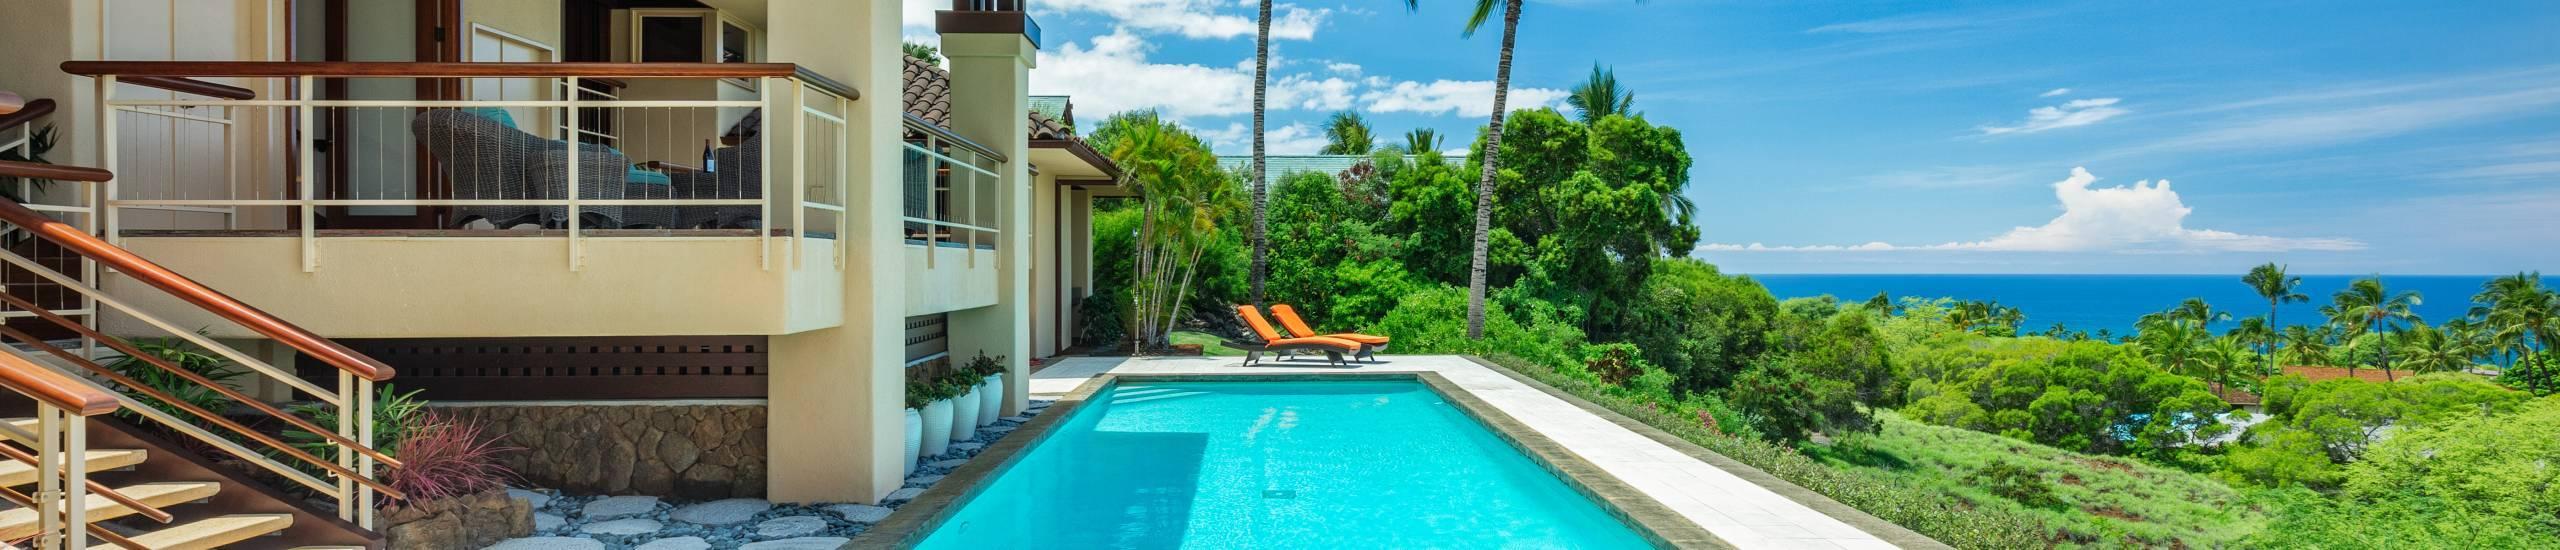 Mauna Kea Private Home - Love Pool